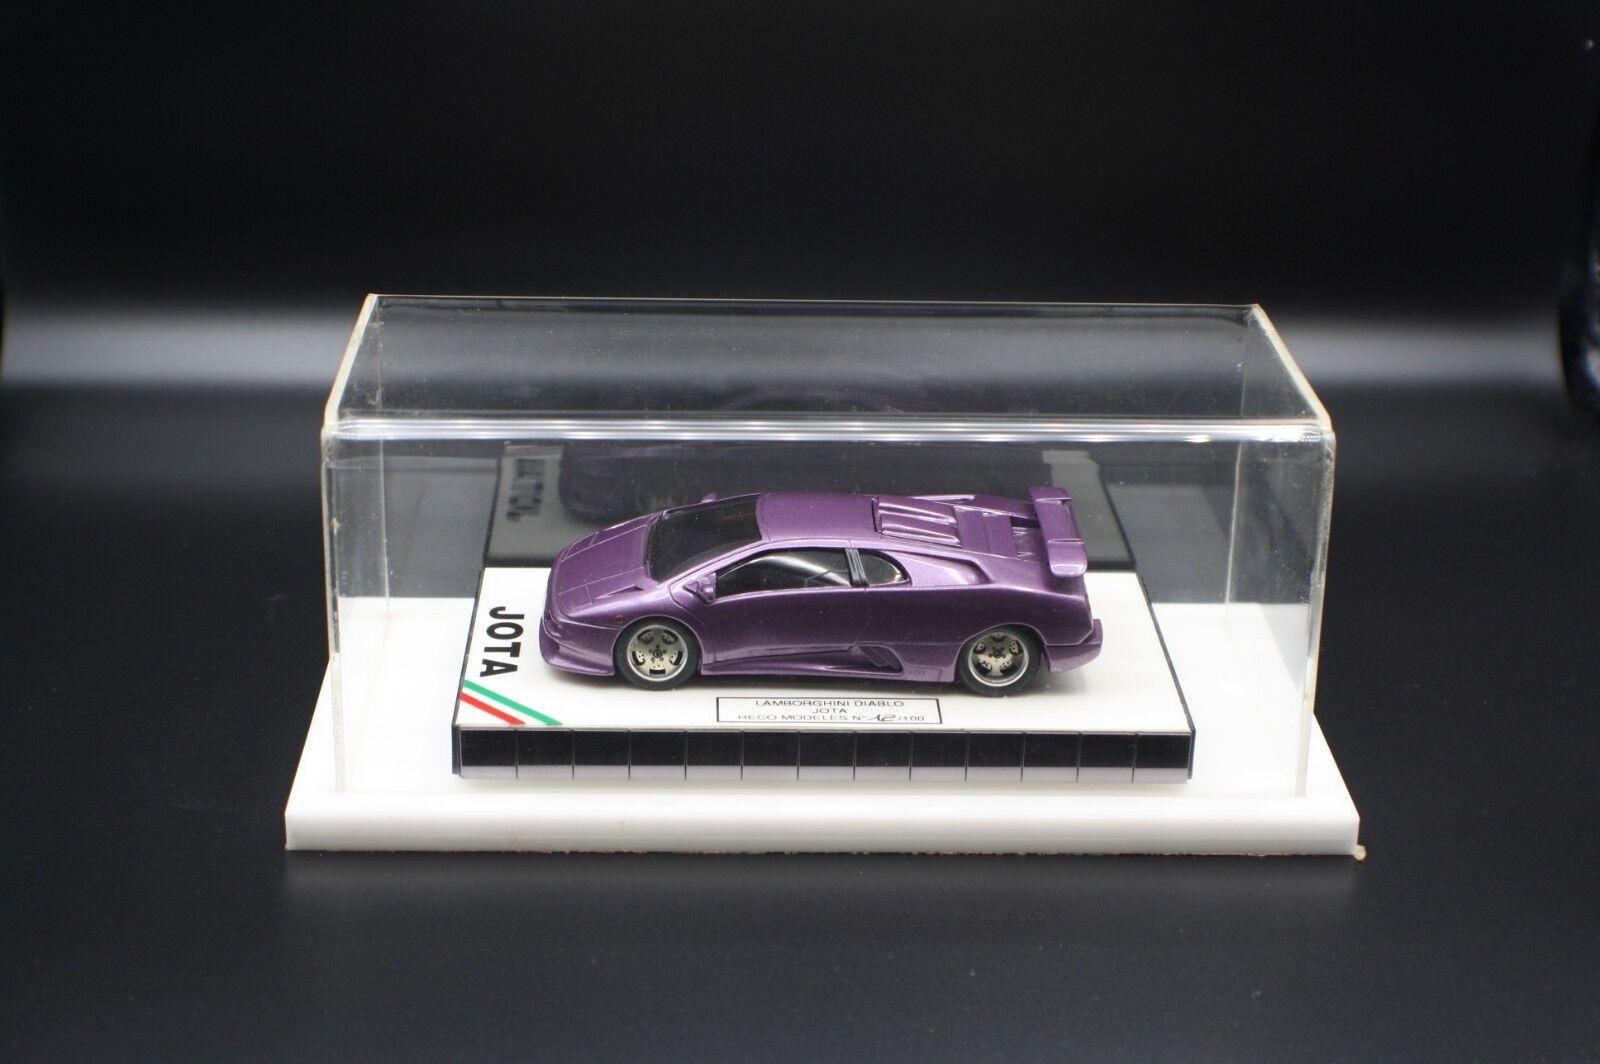 1 43 HECO BBR Lamborghini Diablo Jota (Limited 100) Last one